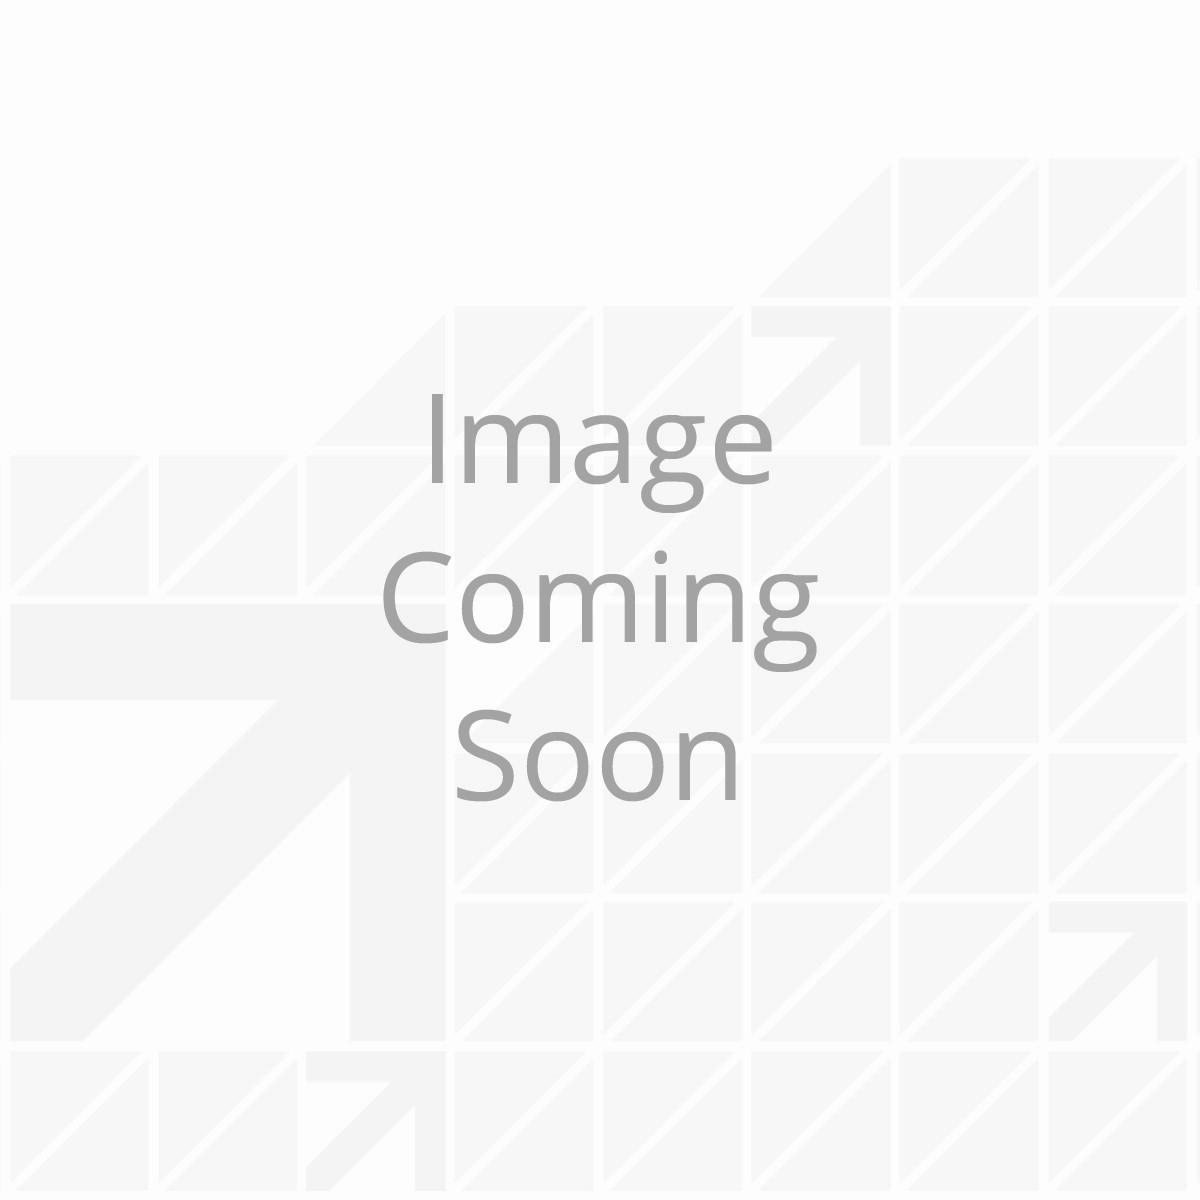 17' Power & Hybrid Awning Roller Assembly - Prepflex Burgundy Fade